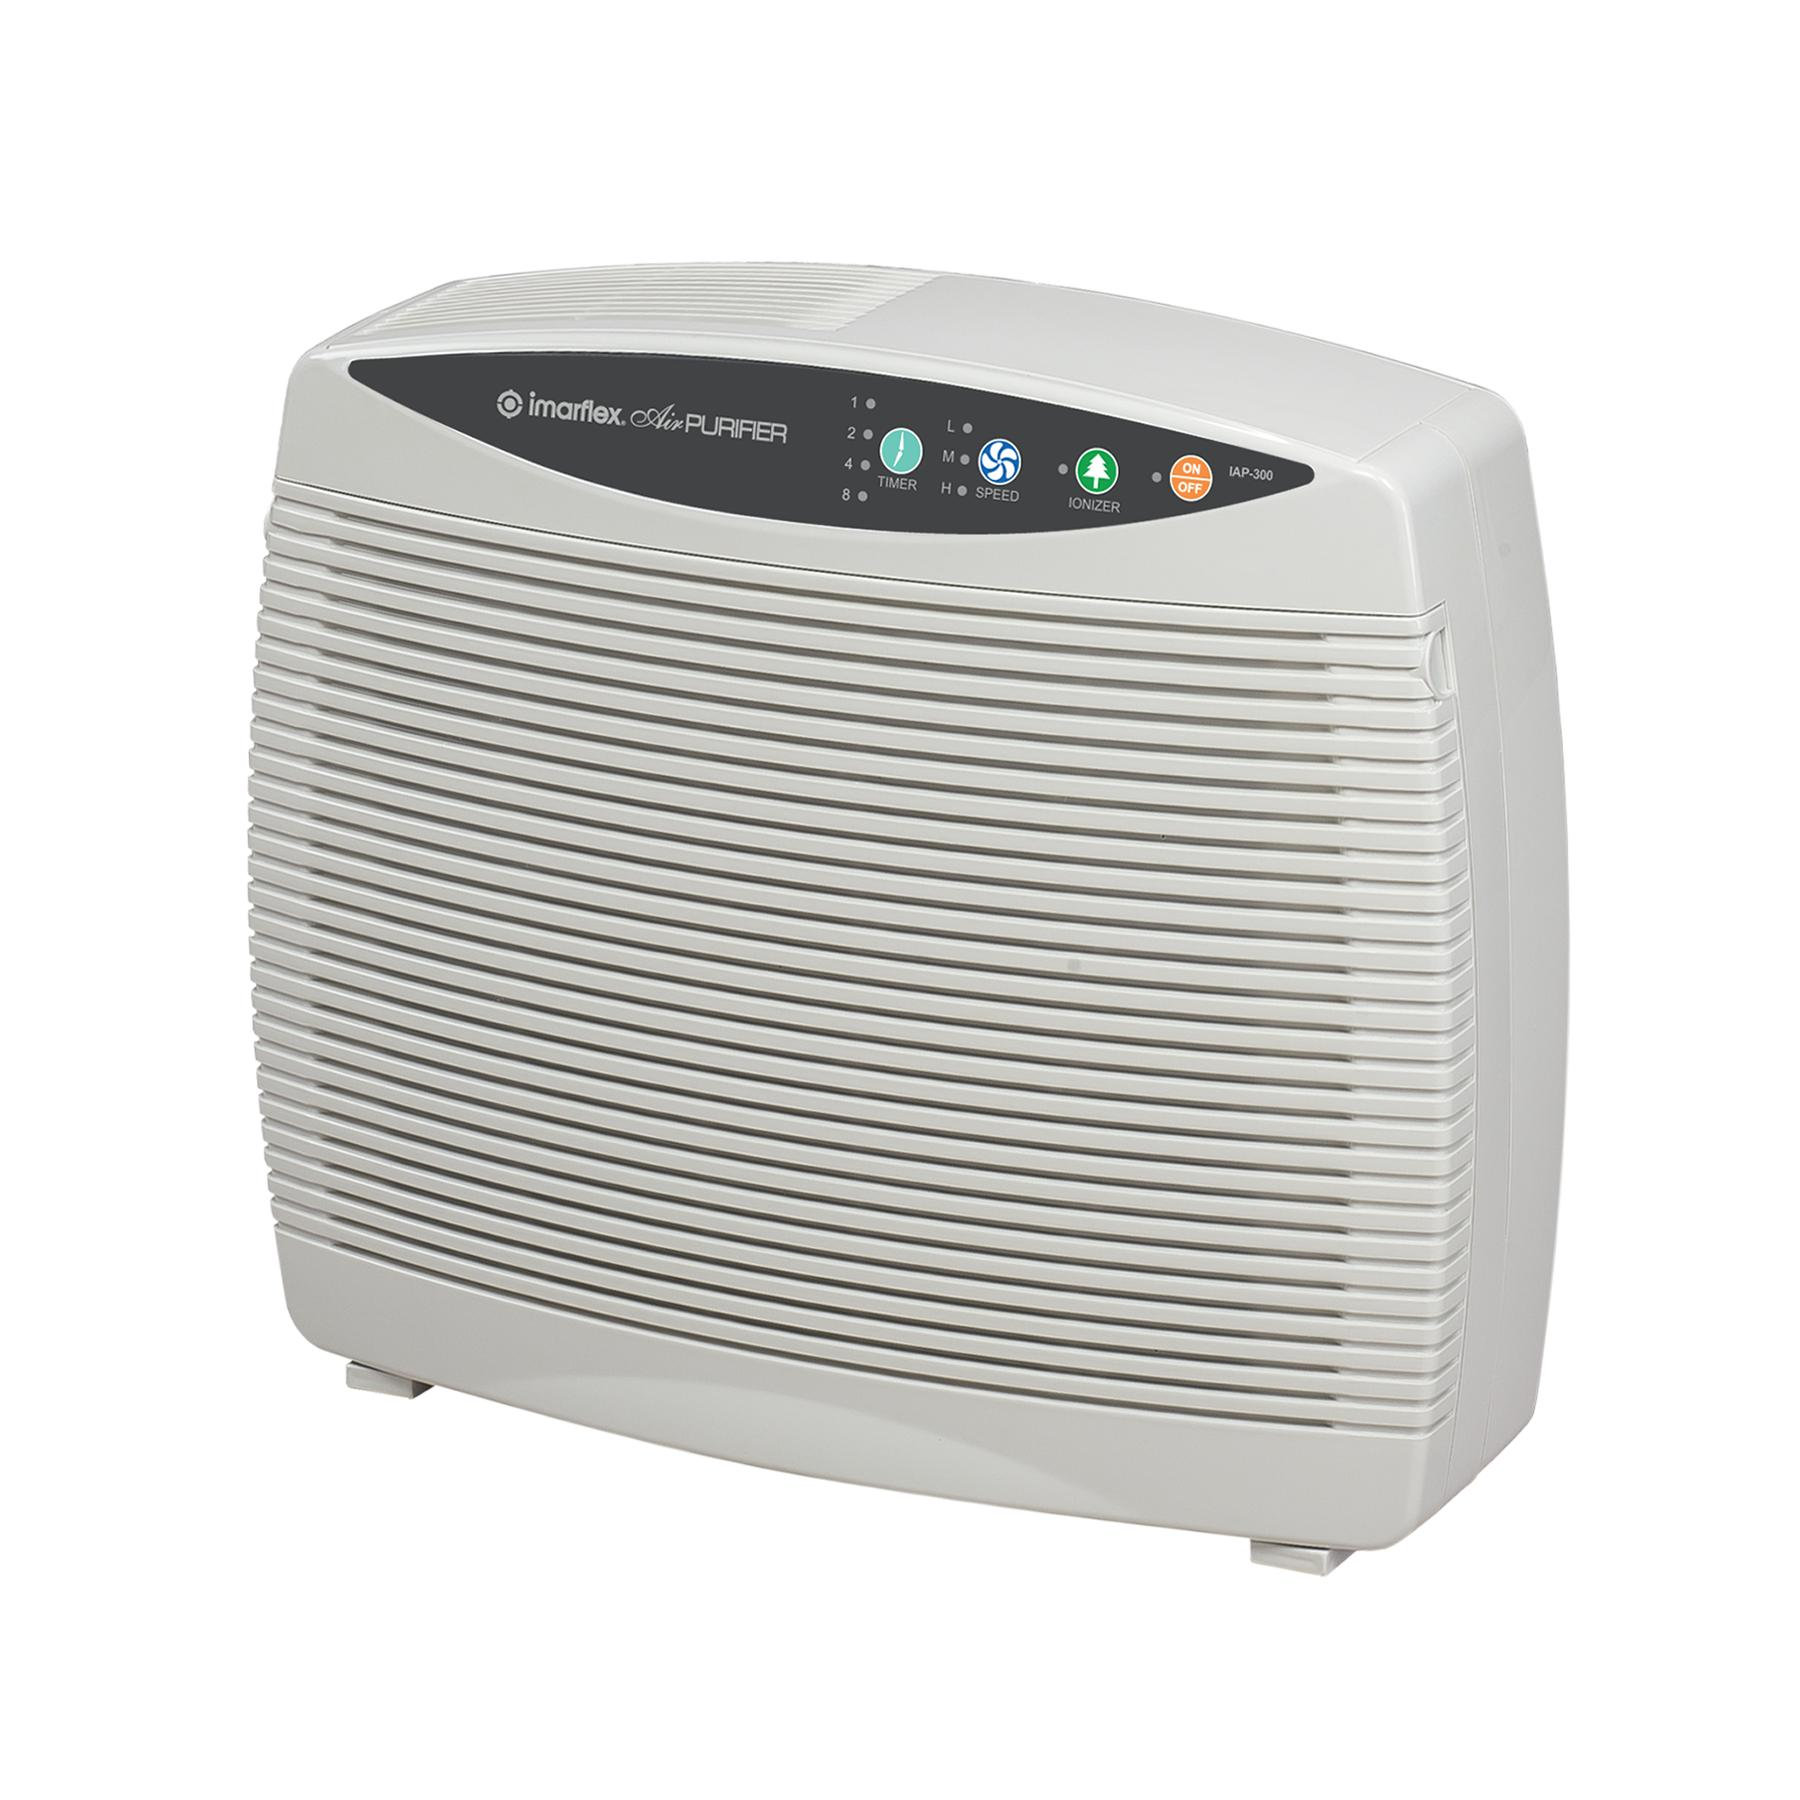 Imarflex Iap-300 Air Purifier (white) By Imarflex.